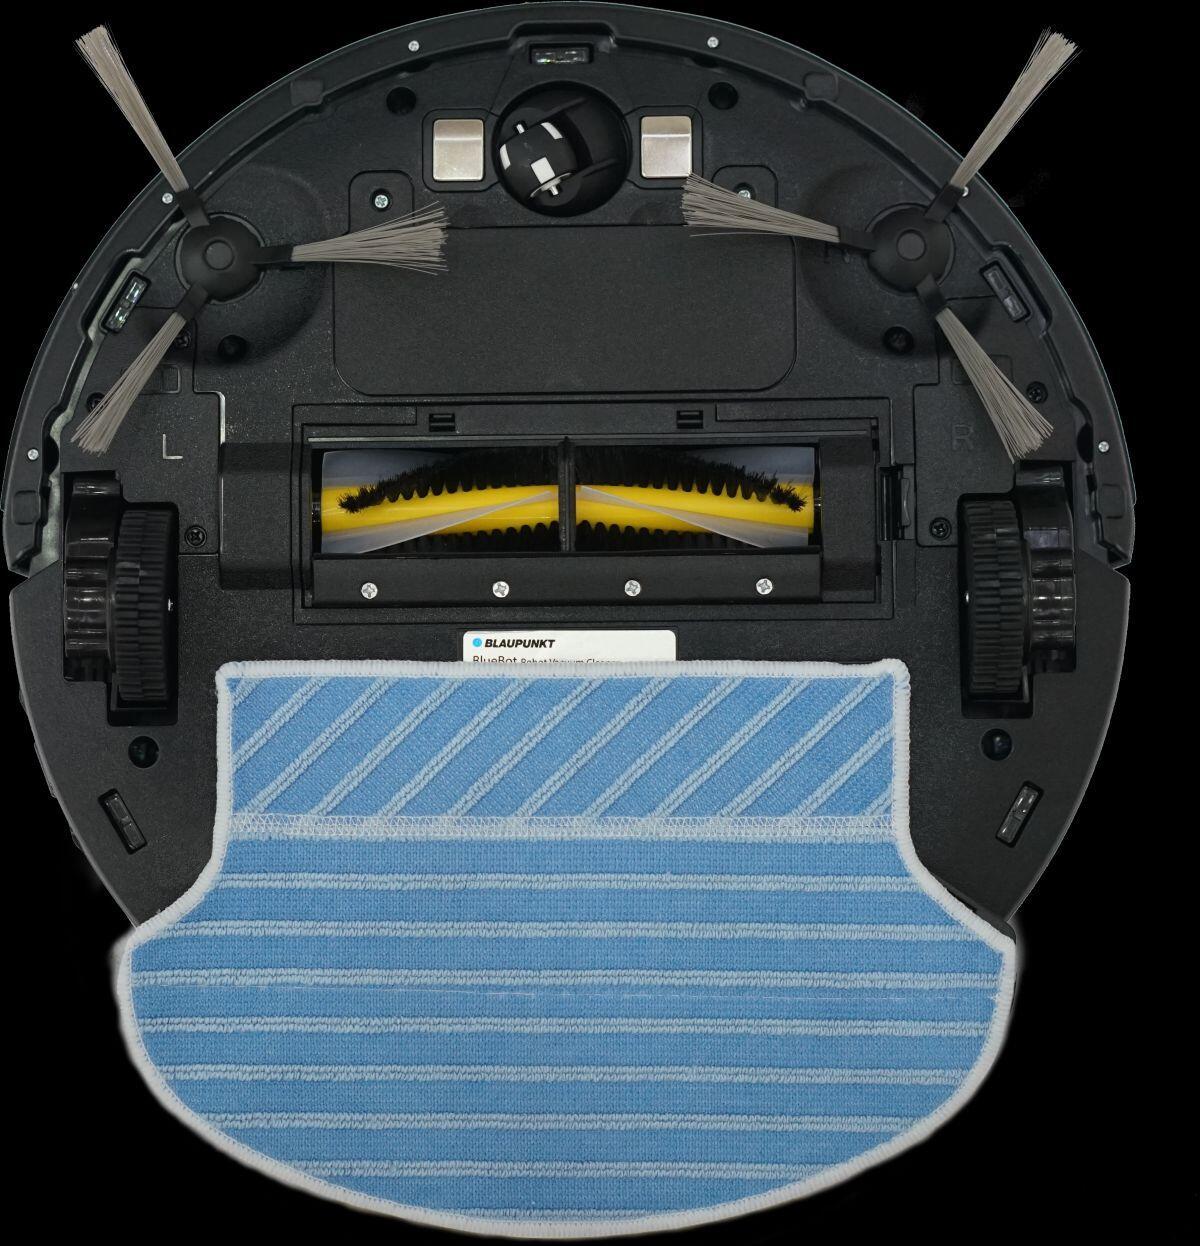 Bluebot Xsmart Robotic 3